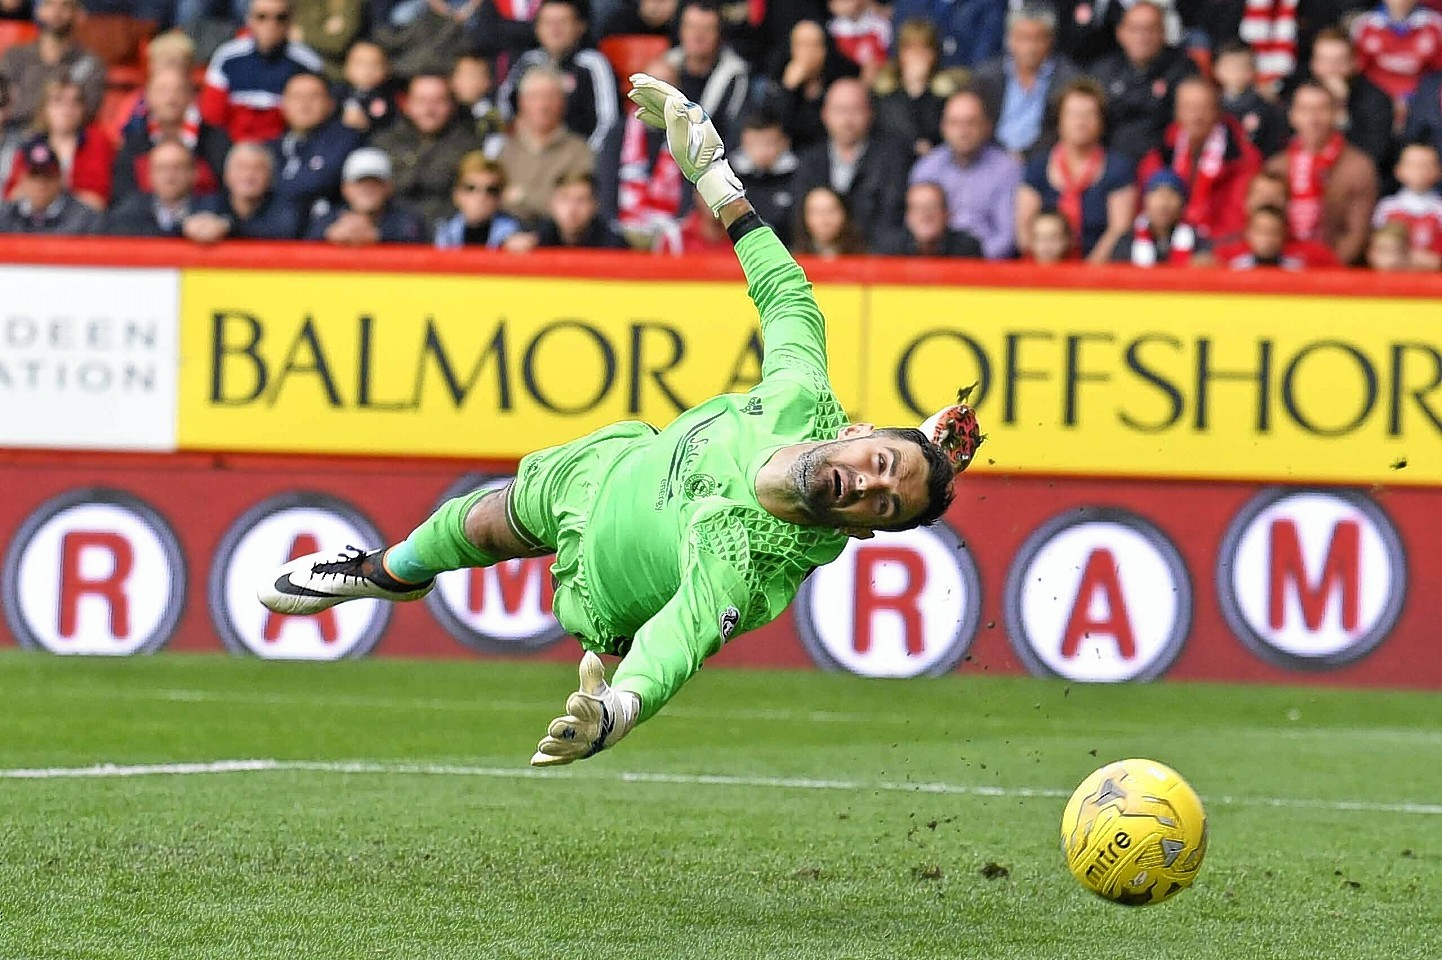 Aberdeen goalkeeper Joe Lewis' late save proved crucial